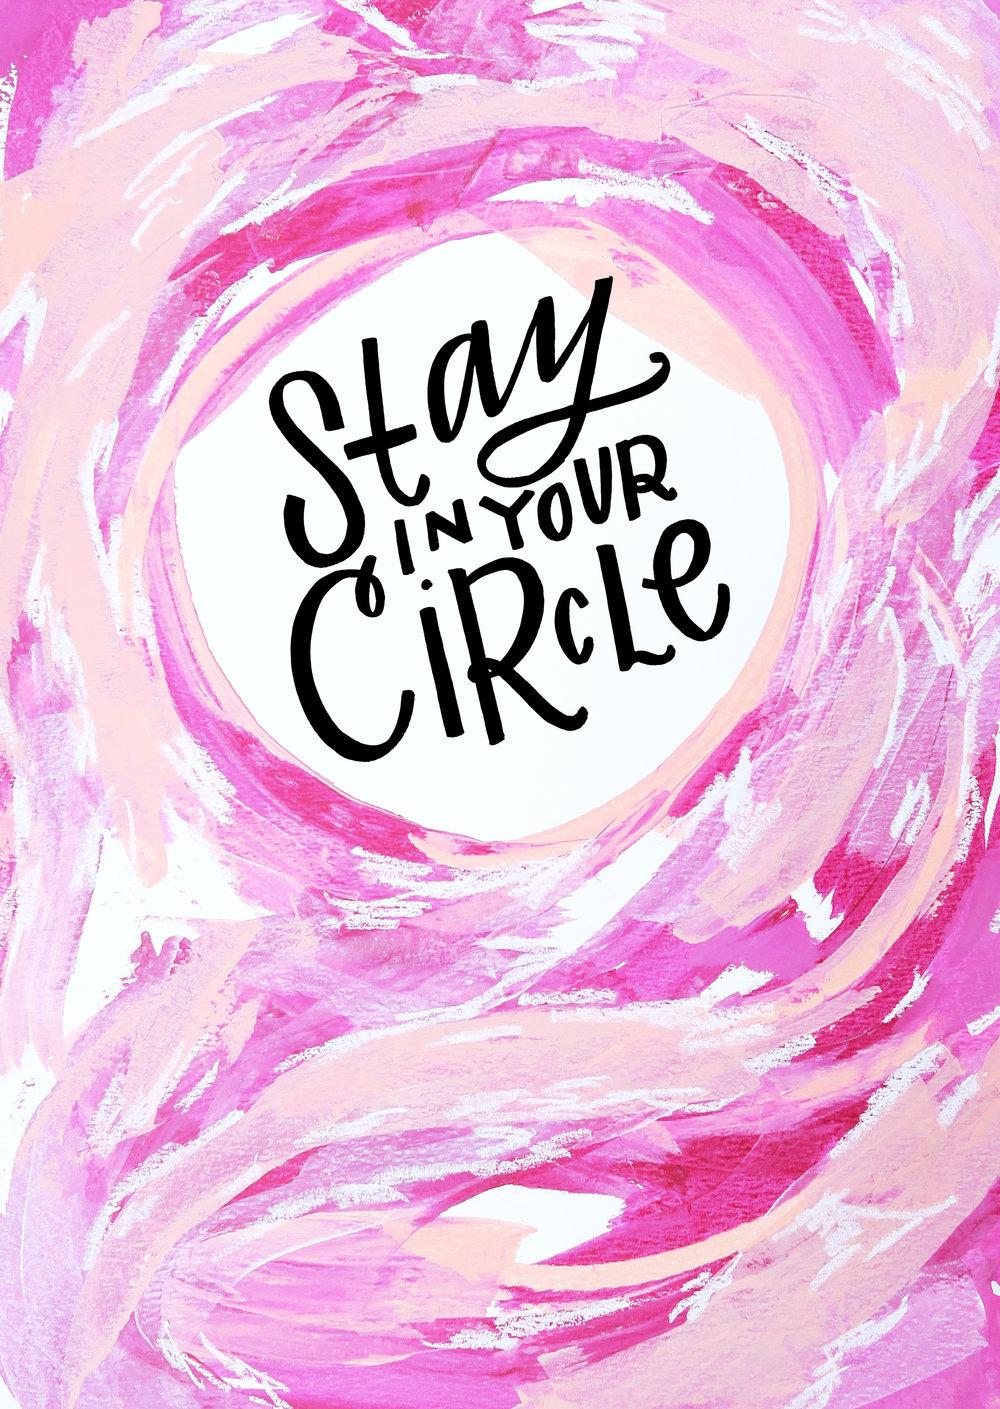 3/20/16: Circle